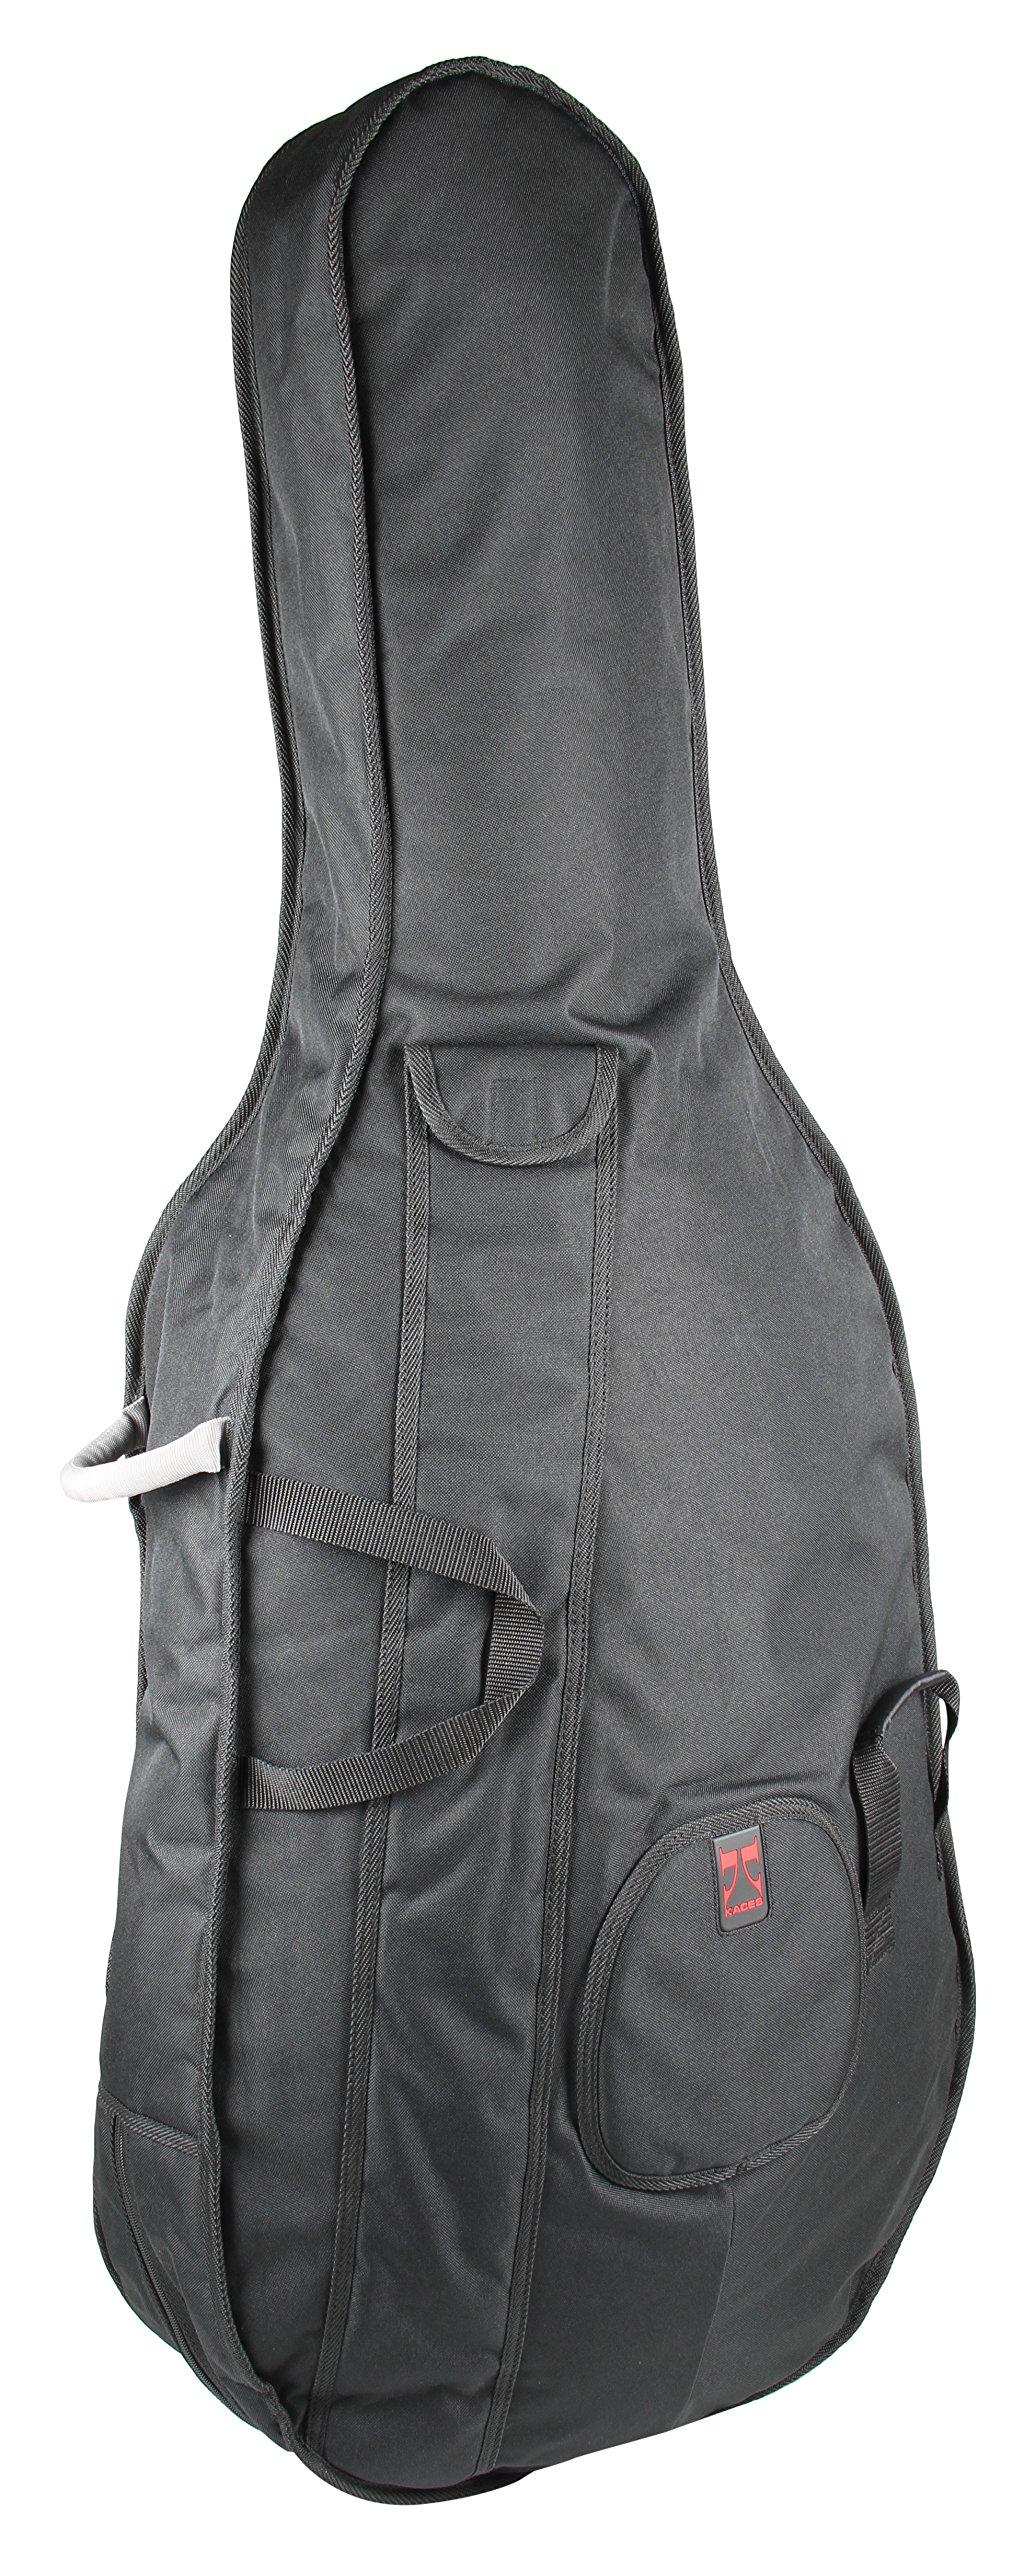 Kaces UKCB-4/4 University Series 4/4 Size Cello Bag